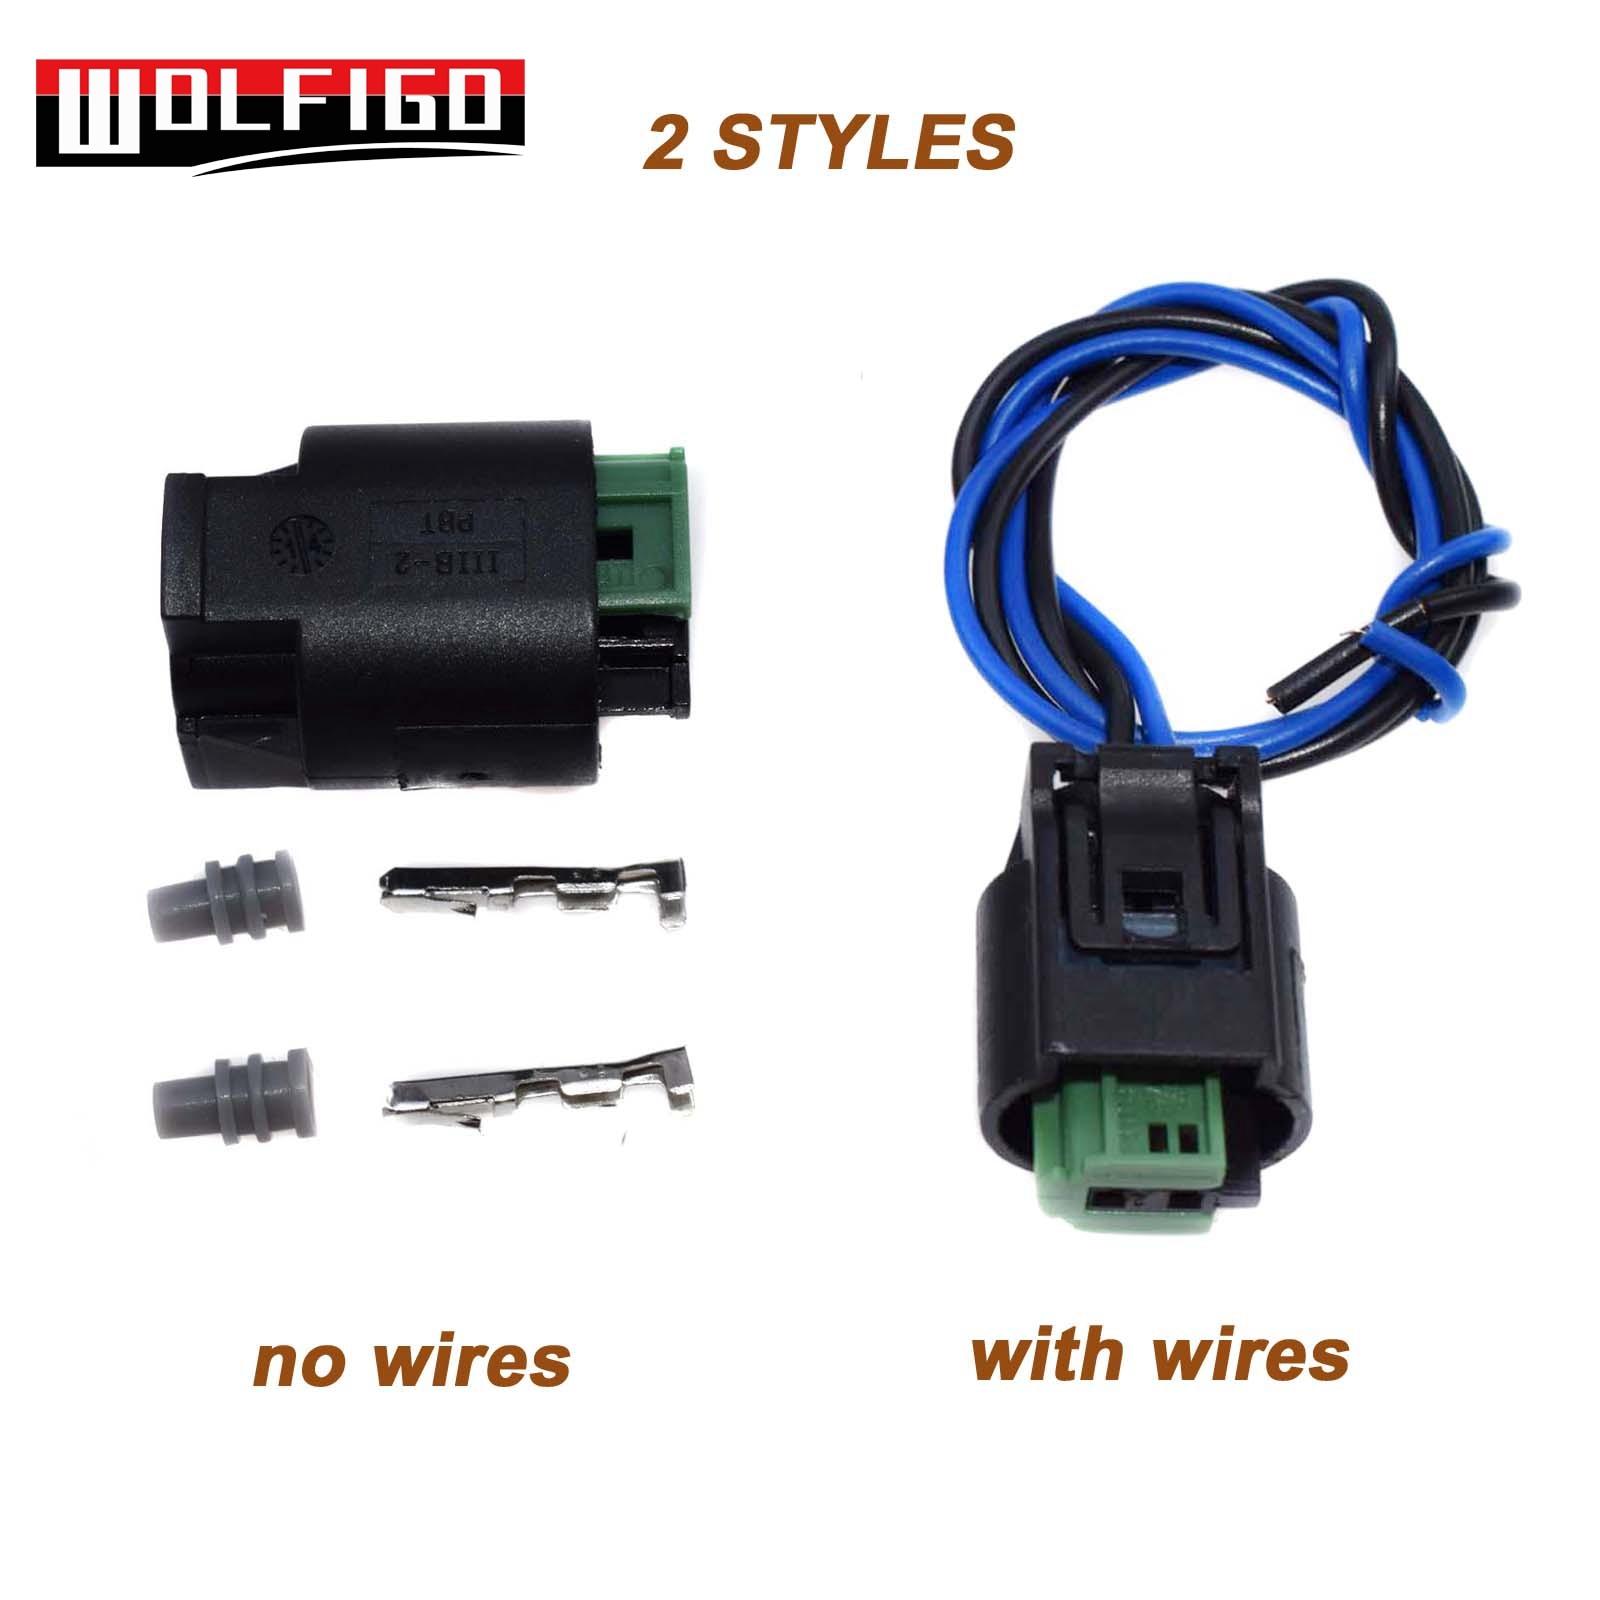 WOLFIGO 1 Set / 10 SetsTemperature Sensor 2 Pin Connector Socket Plug W/ or W/O Wires 1 967644 1 968405 1 For BMW 3 5 7 Series|Temperature Sensor| |  - title=